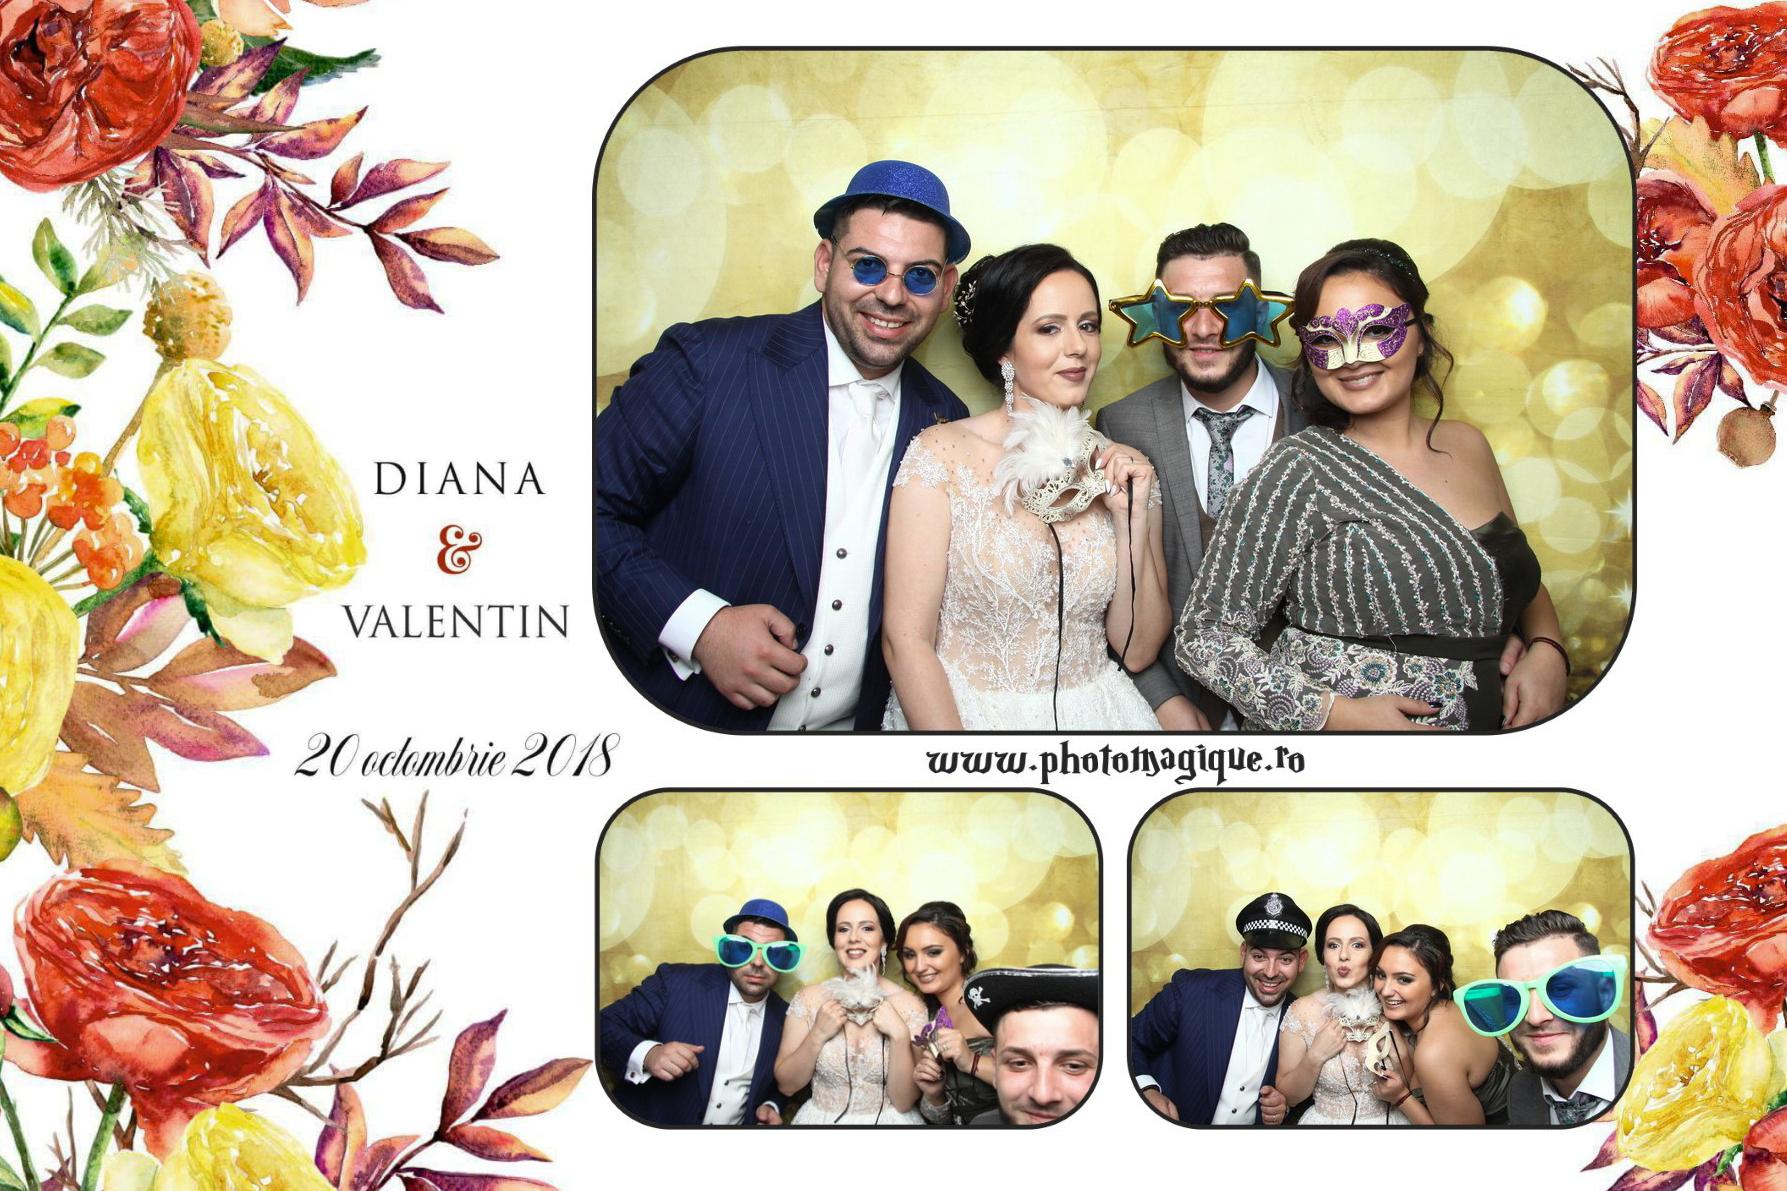 https://www.photomagique.ro/wp-content/uploads/2020/06/Diana-Valentin.jpg